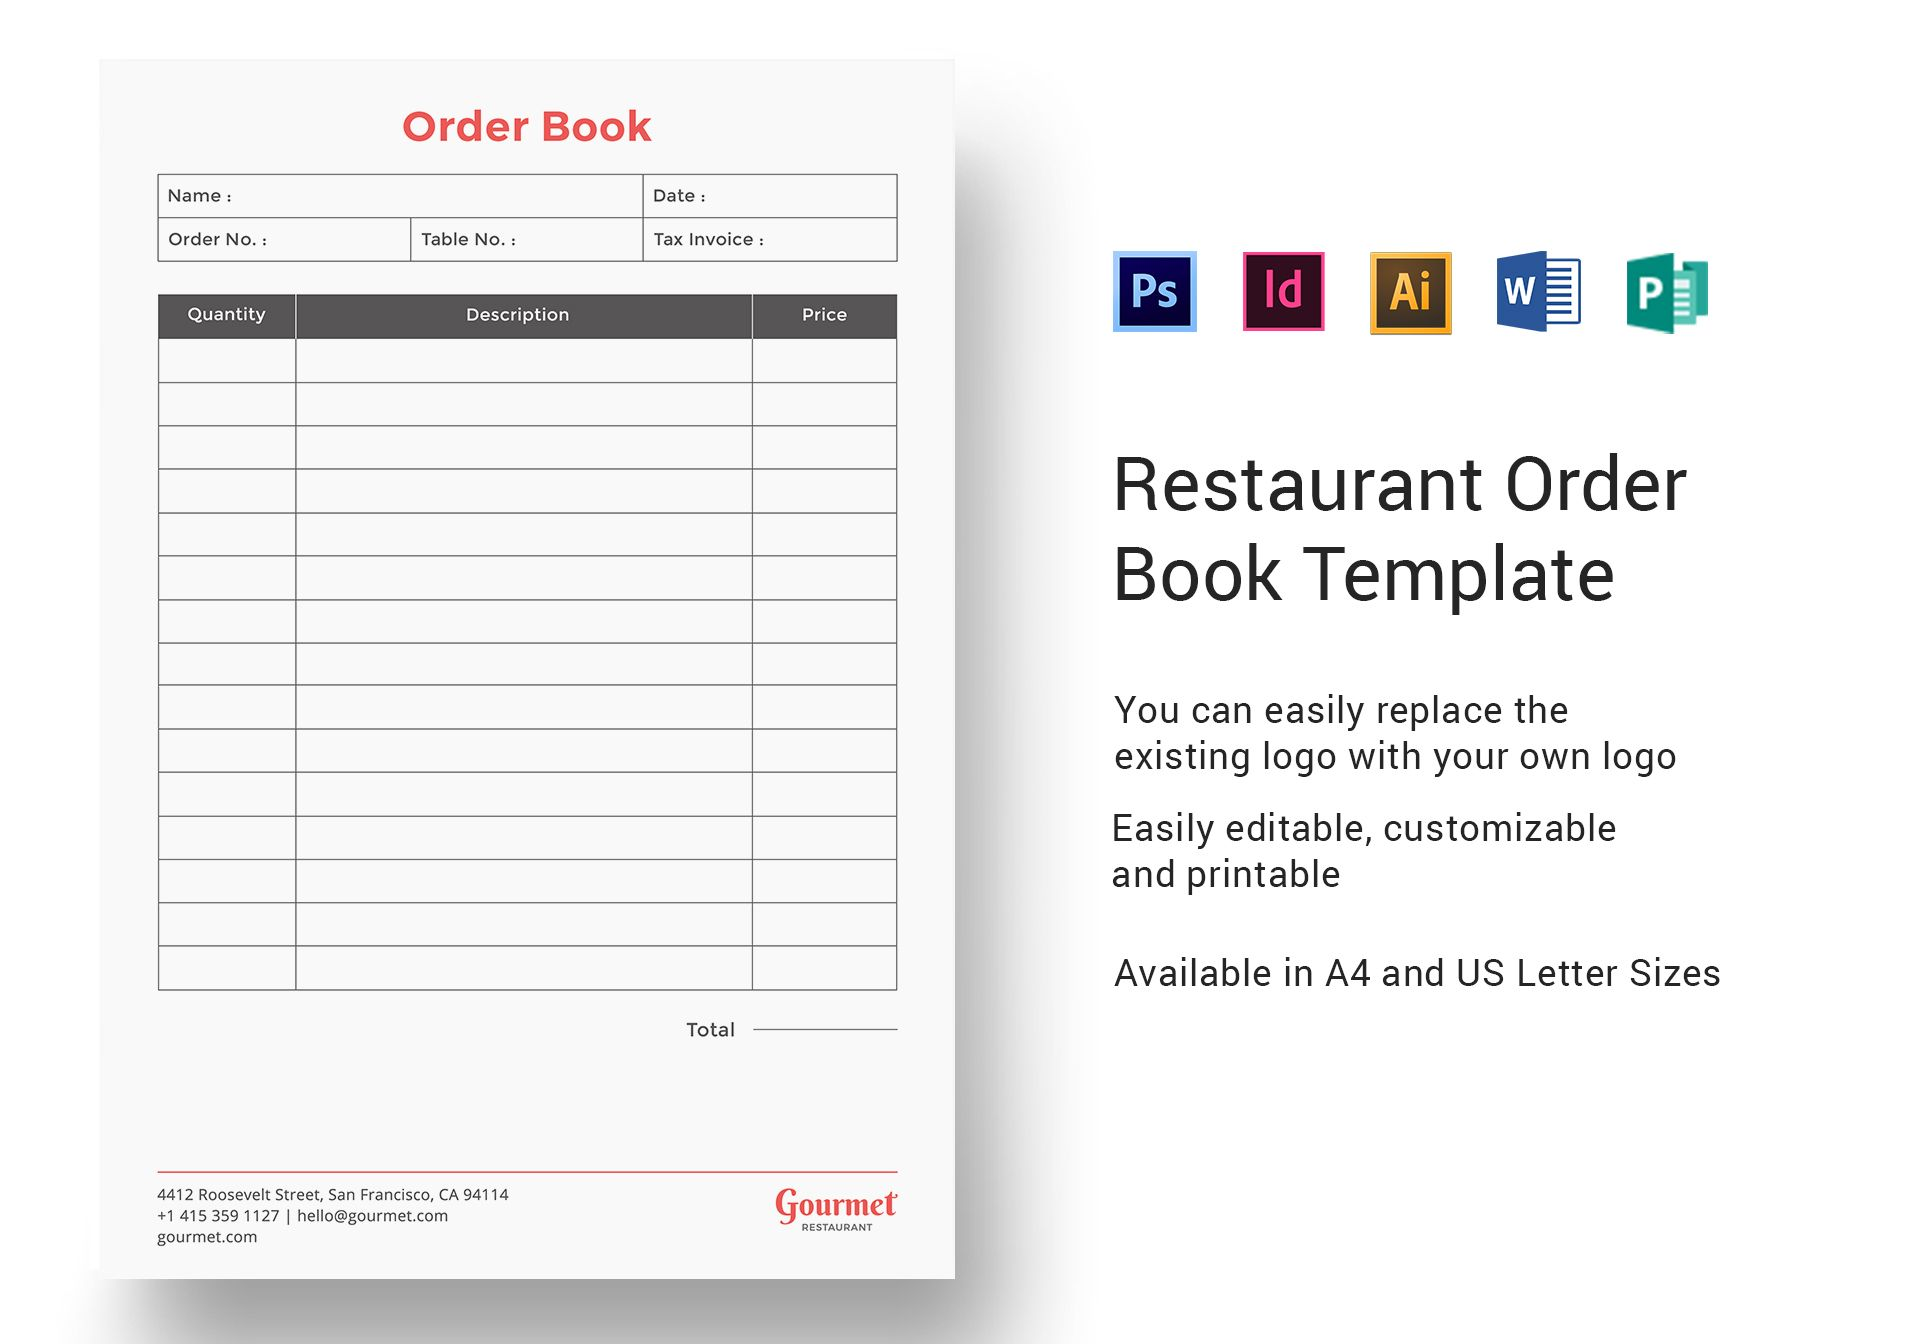 Restaurant Order Book Template In PSD Word Publisher Illustrator InDesign